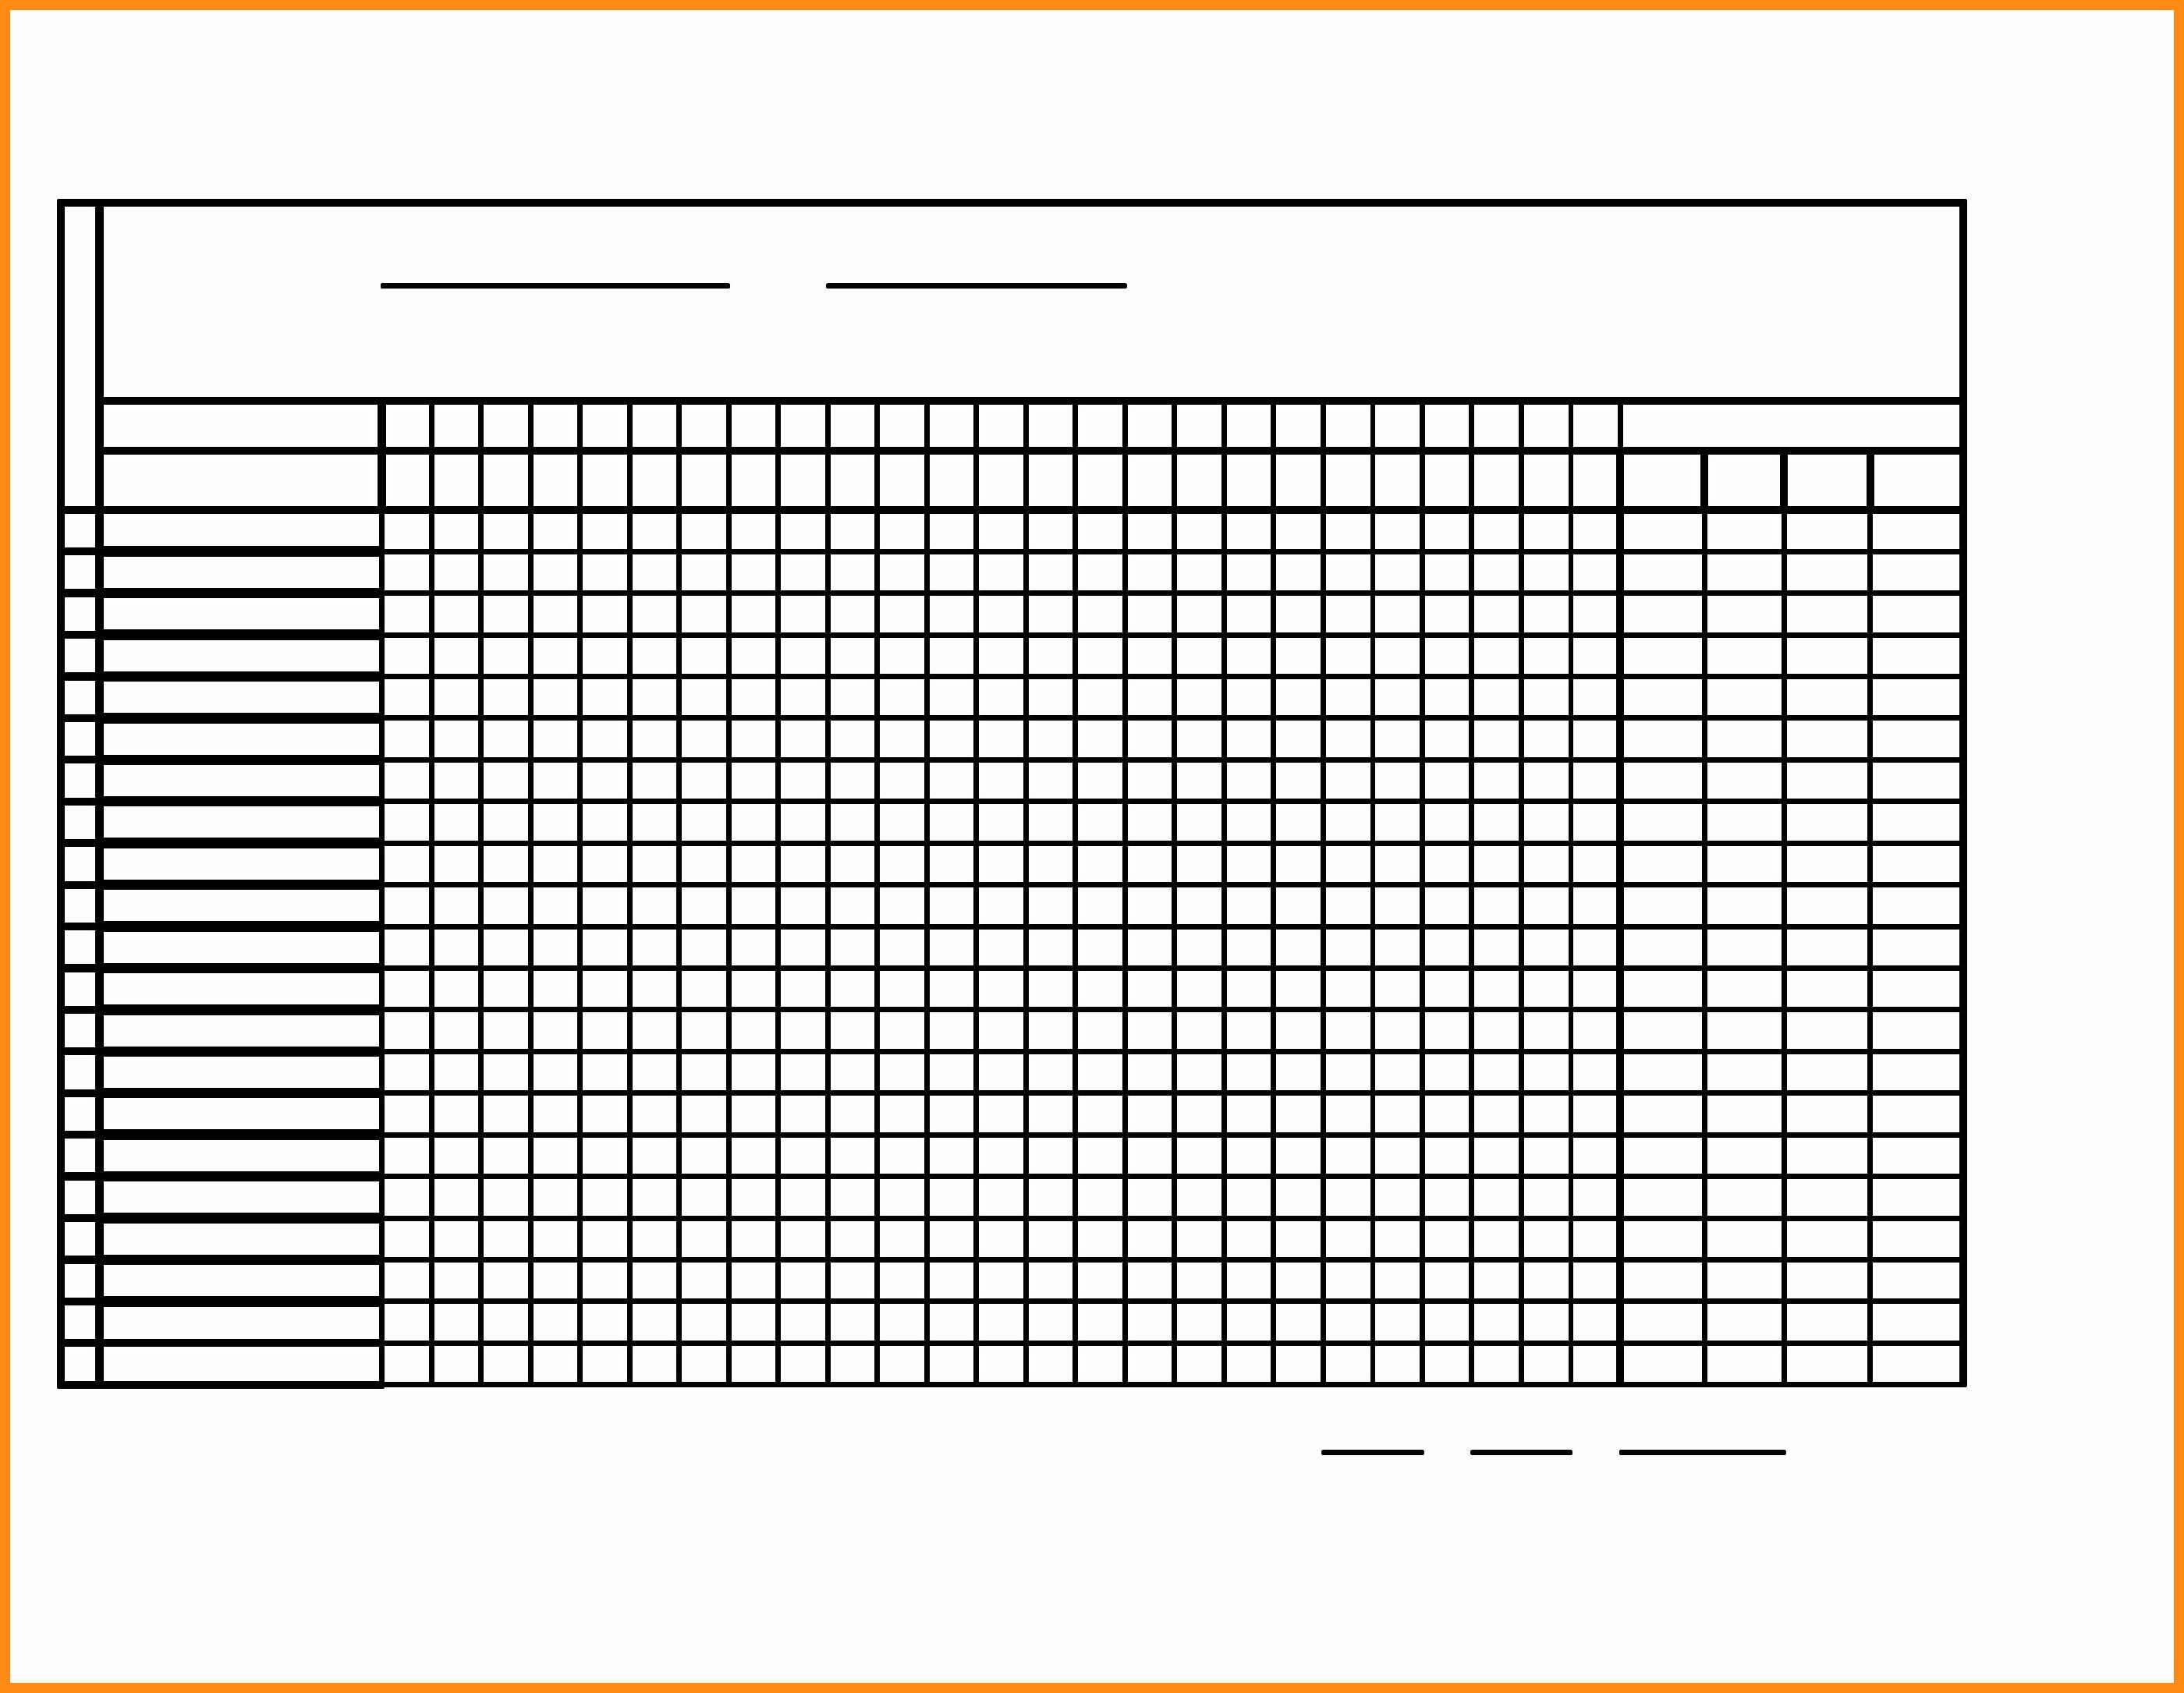 10-11 Attendance Chart Templates | Elainegalindo - Sunday School Attendance Chart Free Printable